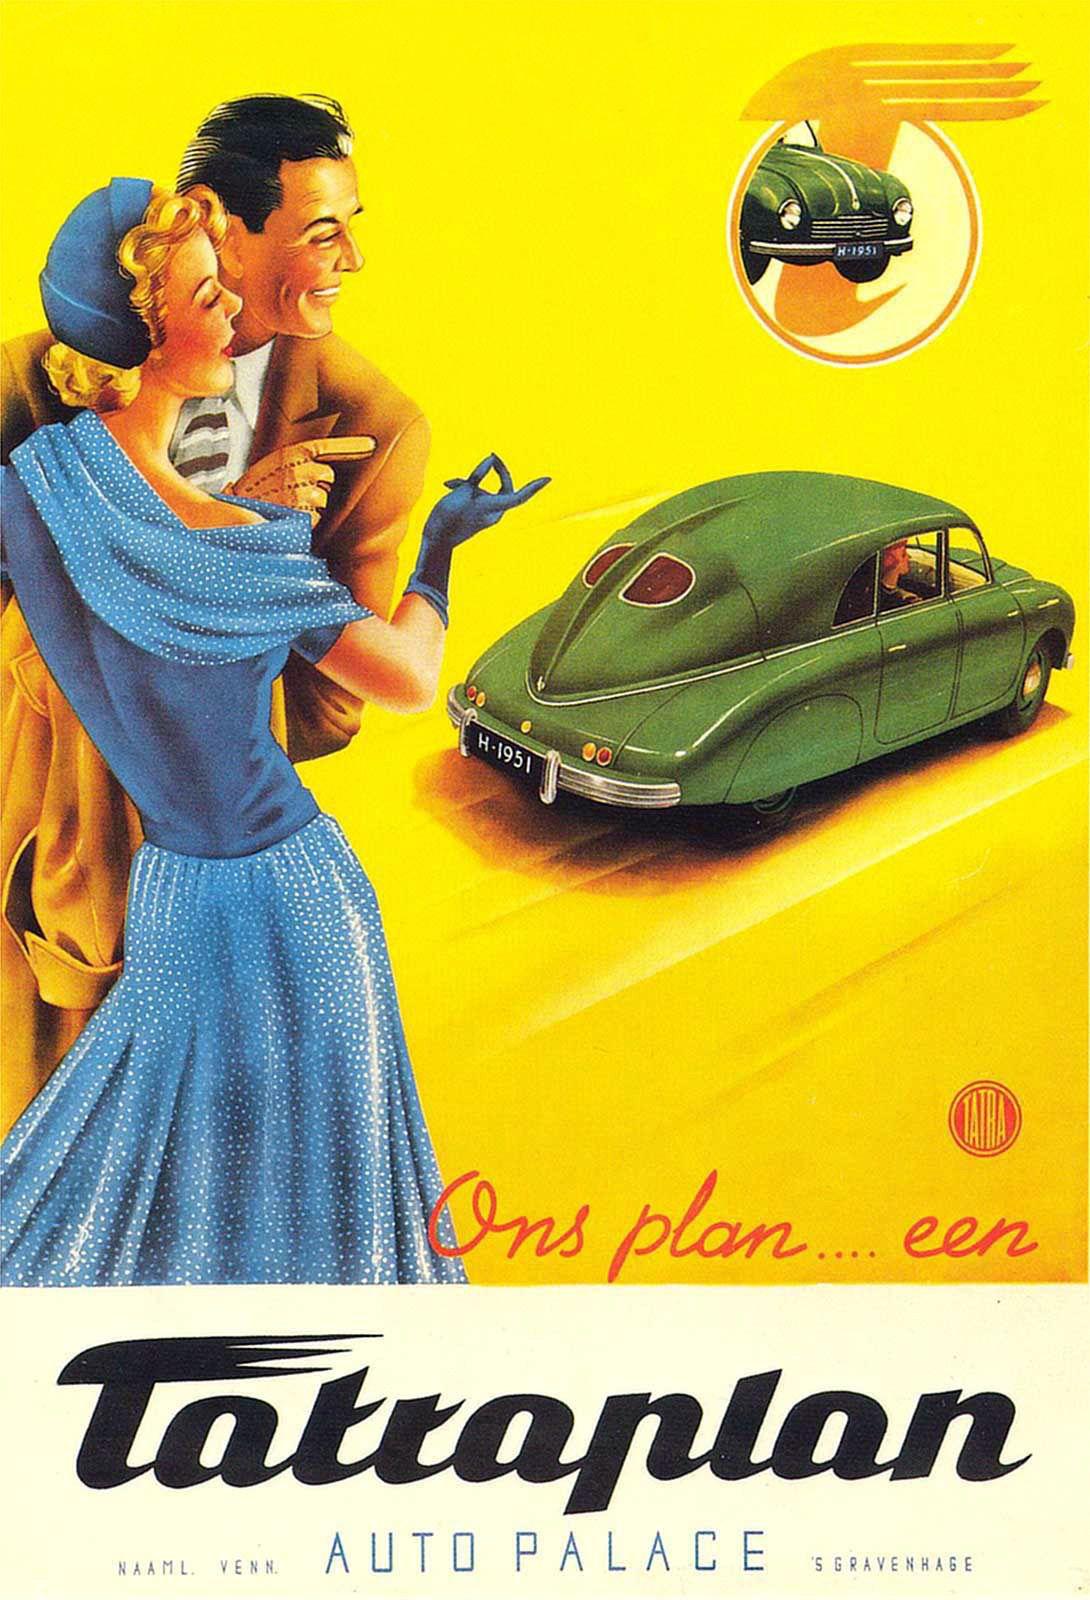 Tattaplan. www.pinterest.com/shorrobi/classic-auto-trader/   Vintage ...